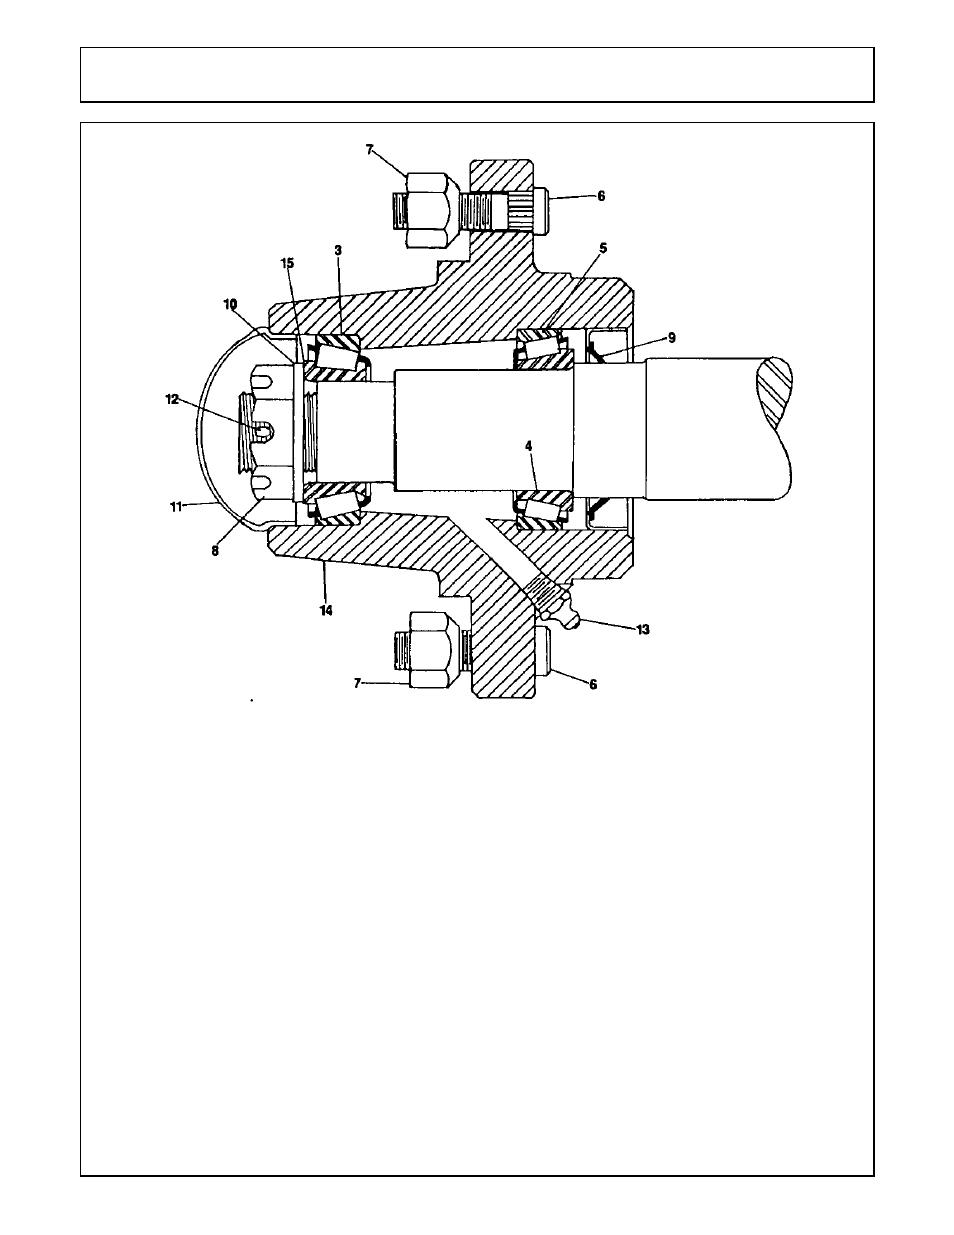 wheel hub assembly rhino mounts 697p user manual page 10 37 rh manualsdir com Rhino Mount Base Plate Inflatable Animal Heads to Mount On Wall